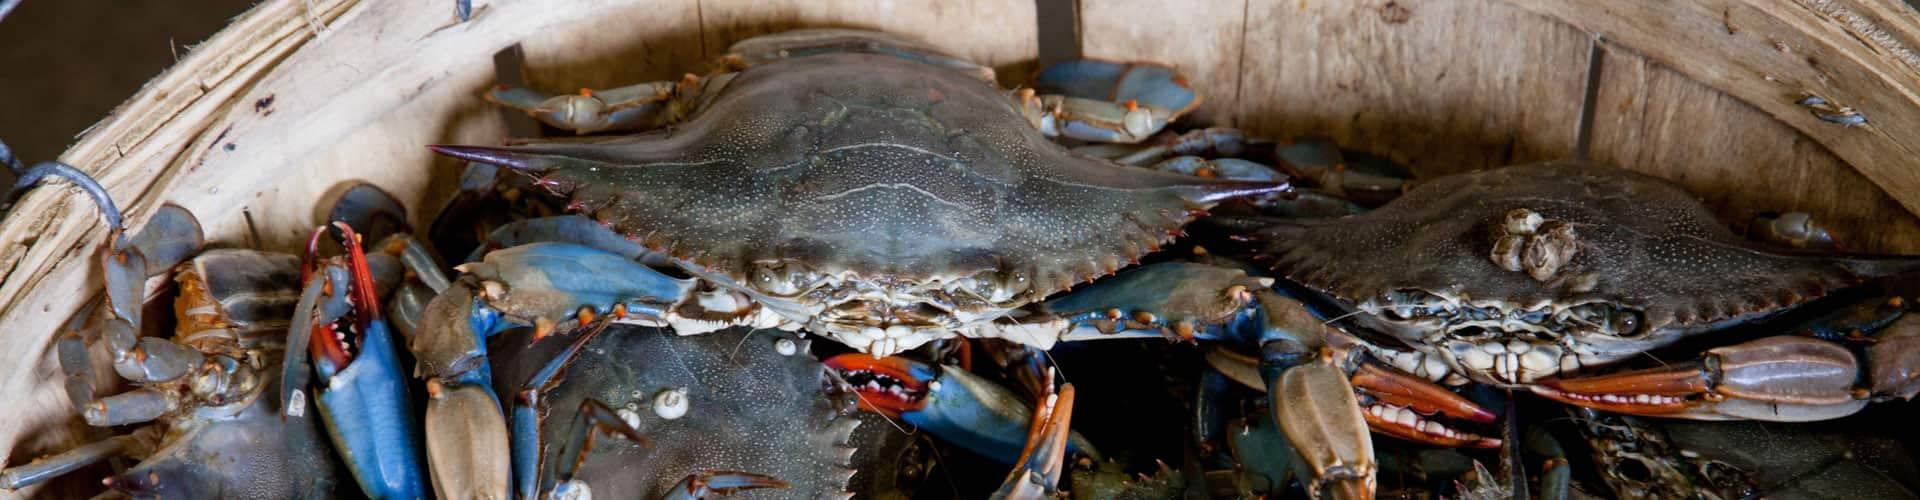 Photo of crabs in a bushel basket.